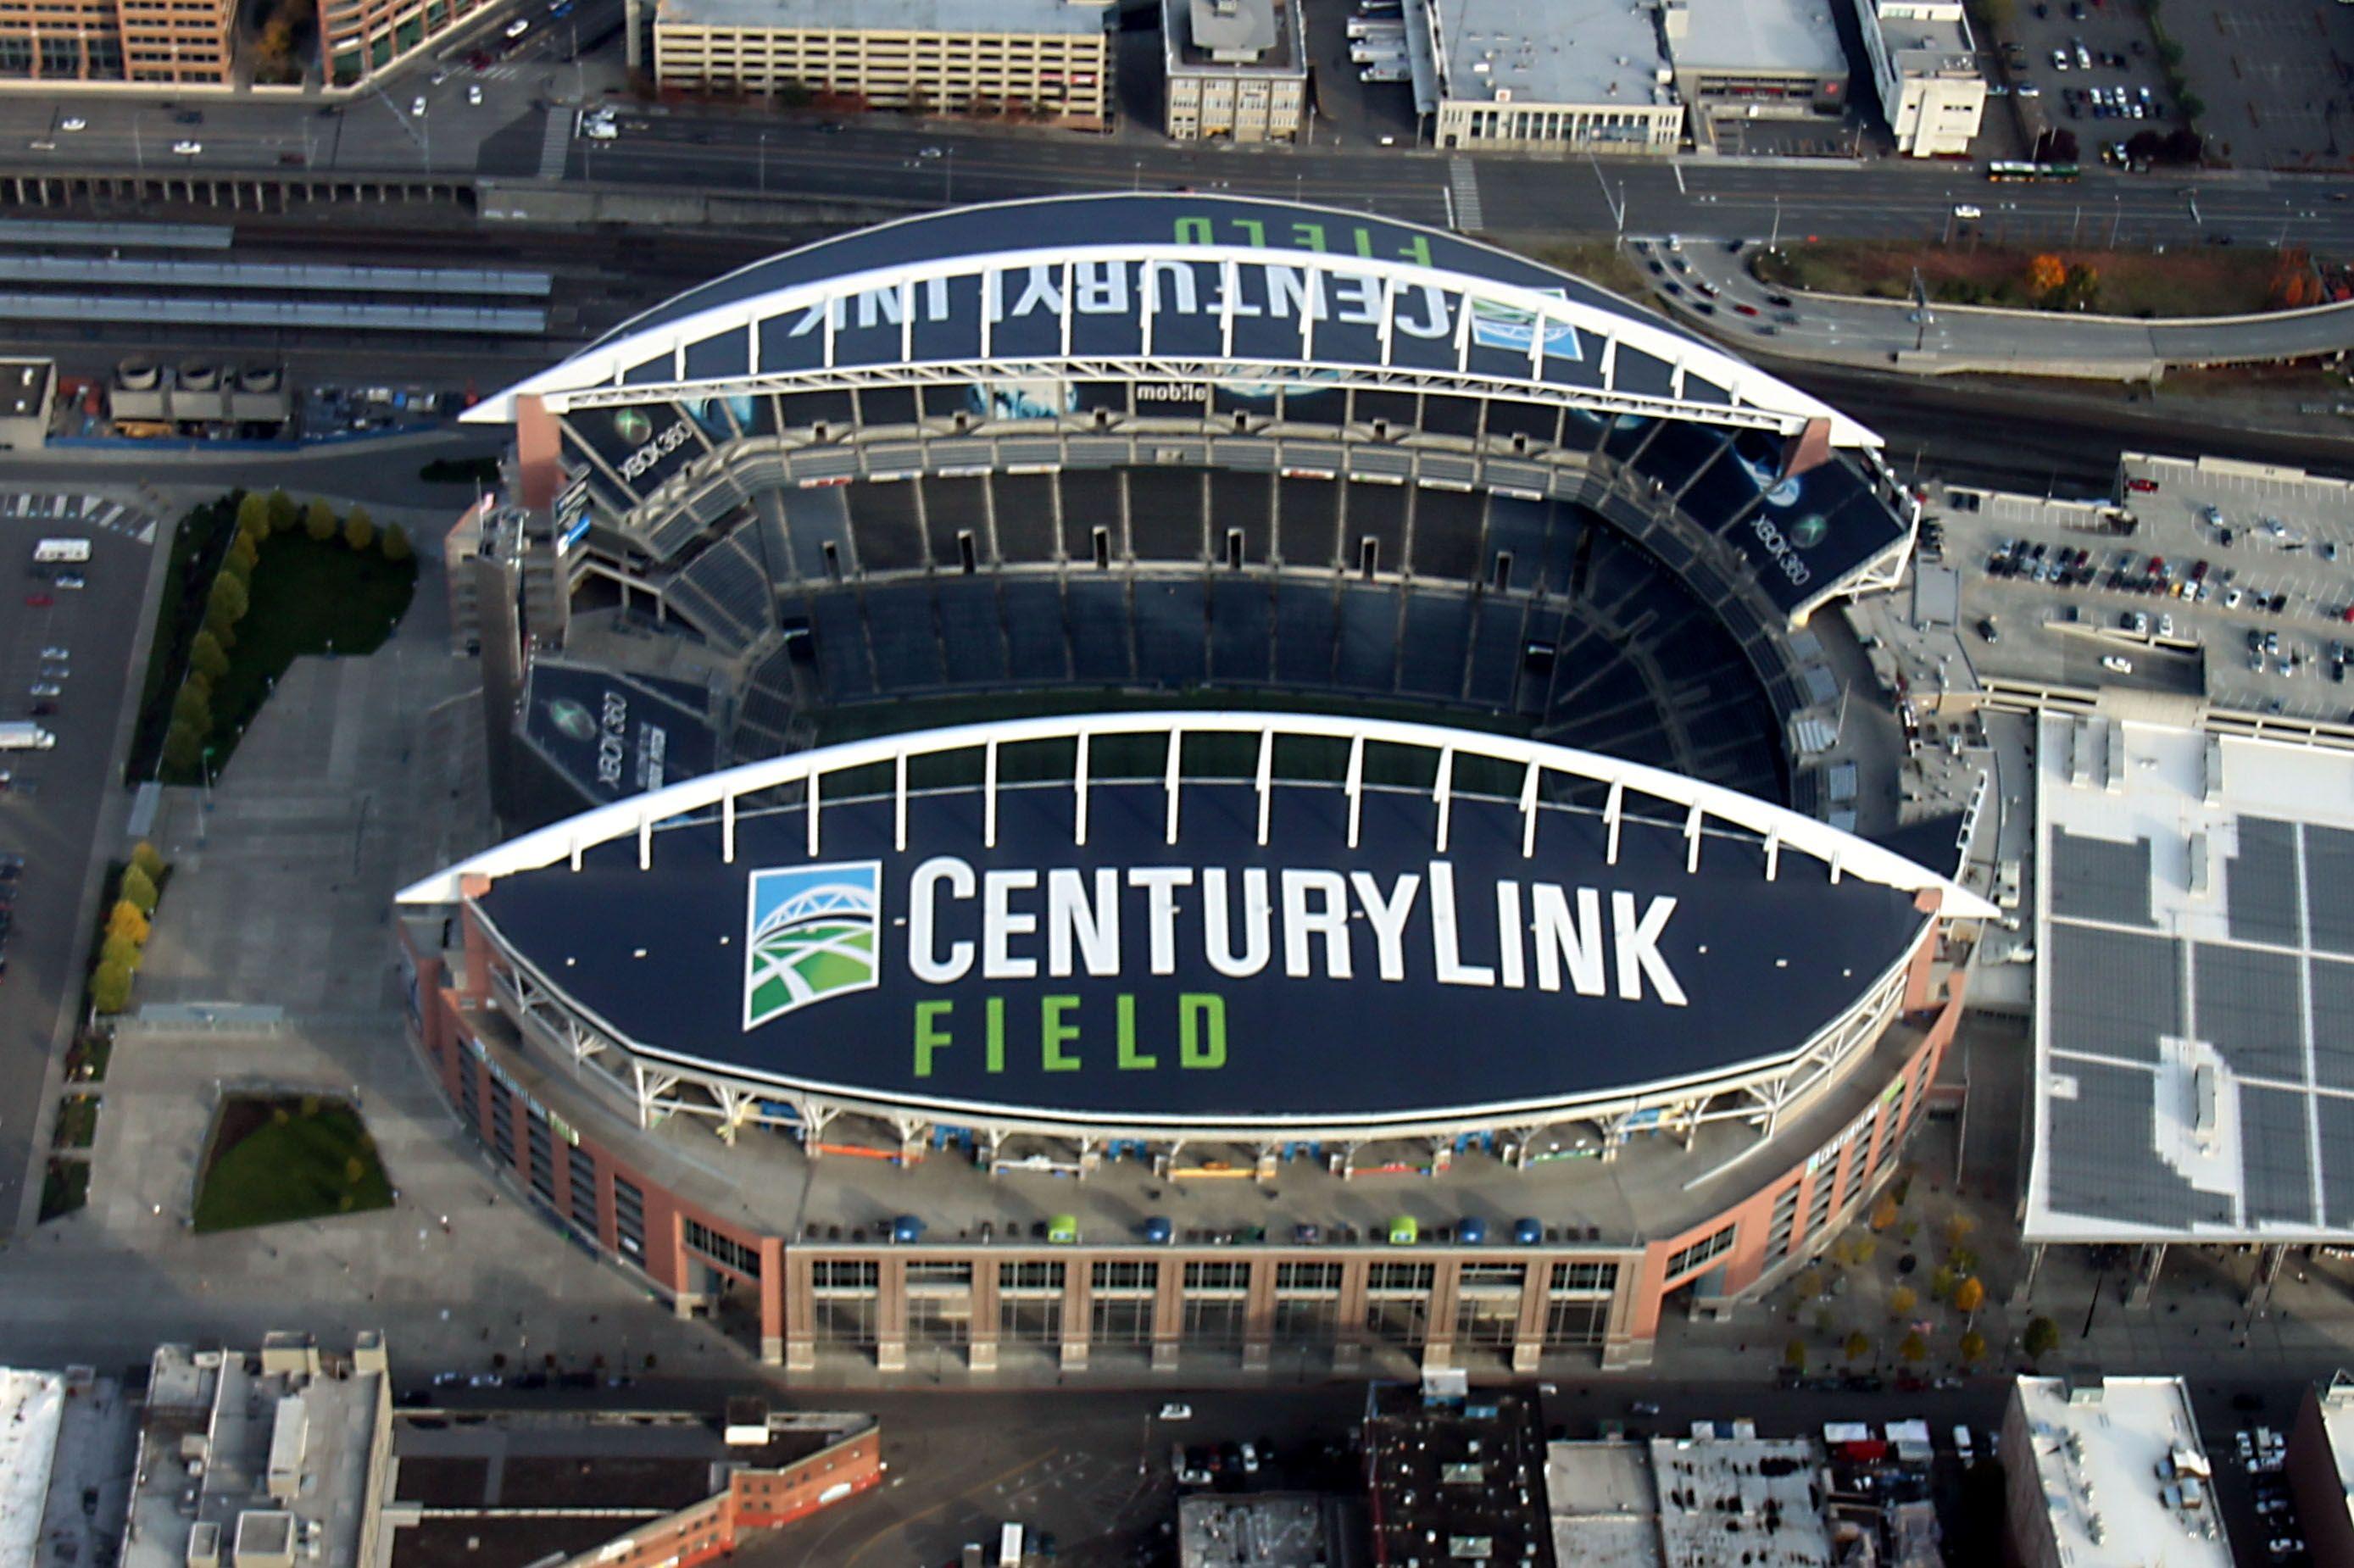 Century Link Field Seating Chart Seahawk Logos Memorabilia Pinterest